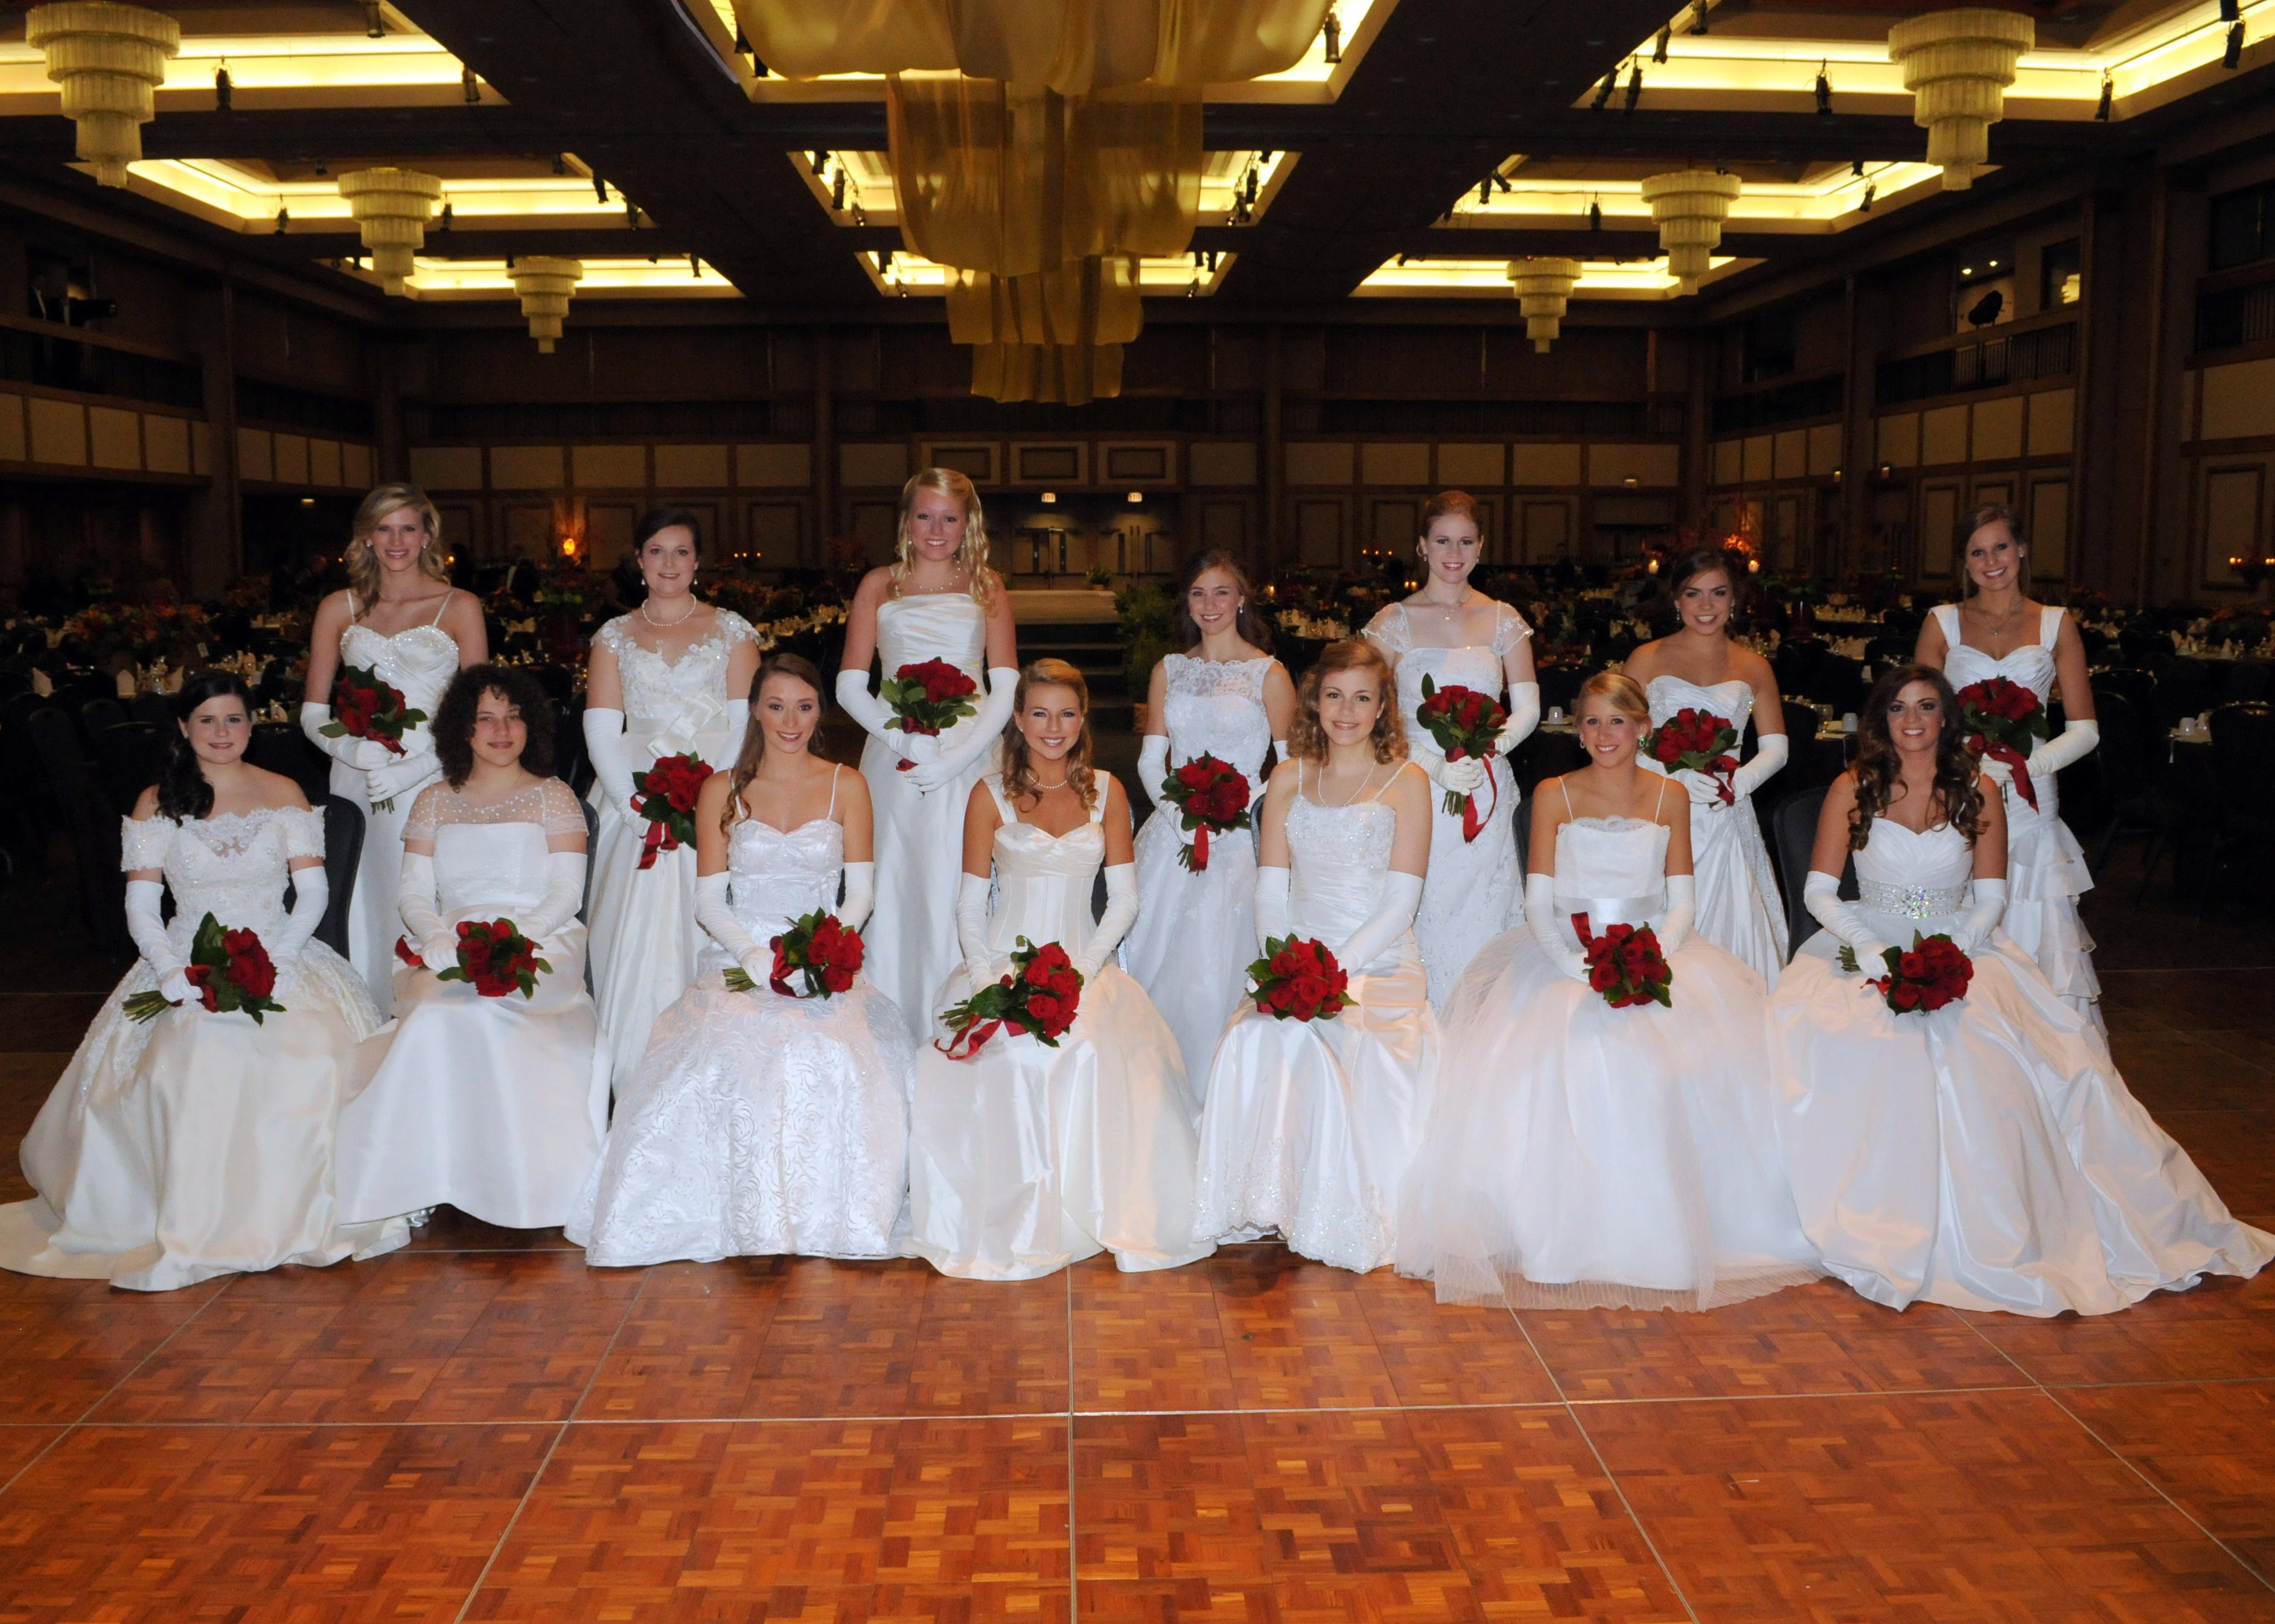 2013 Huntsville Symphony Orchestra Debutantes Group 1